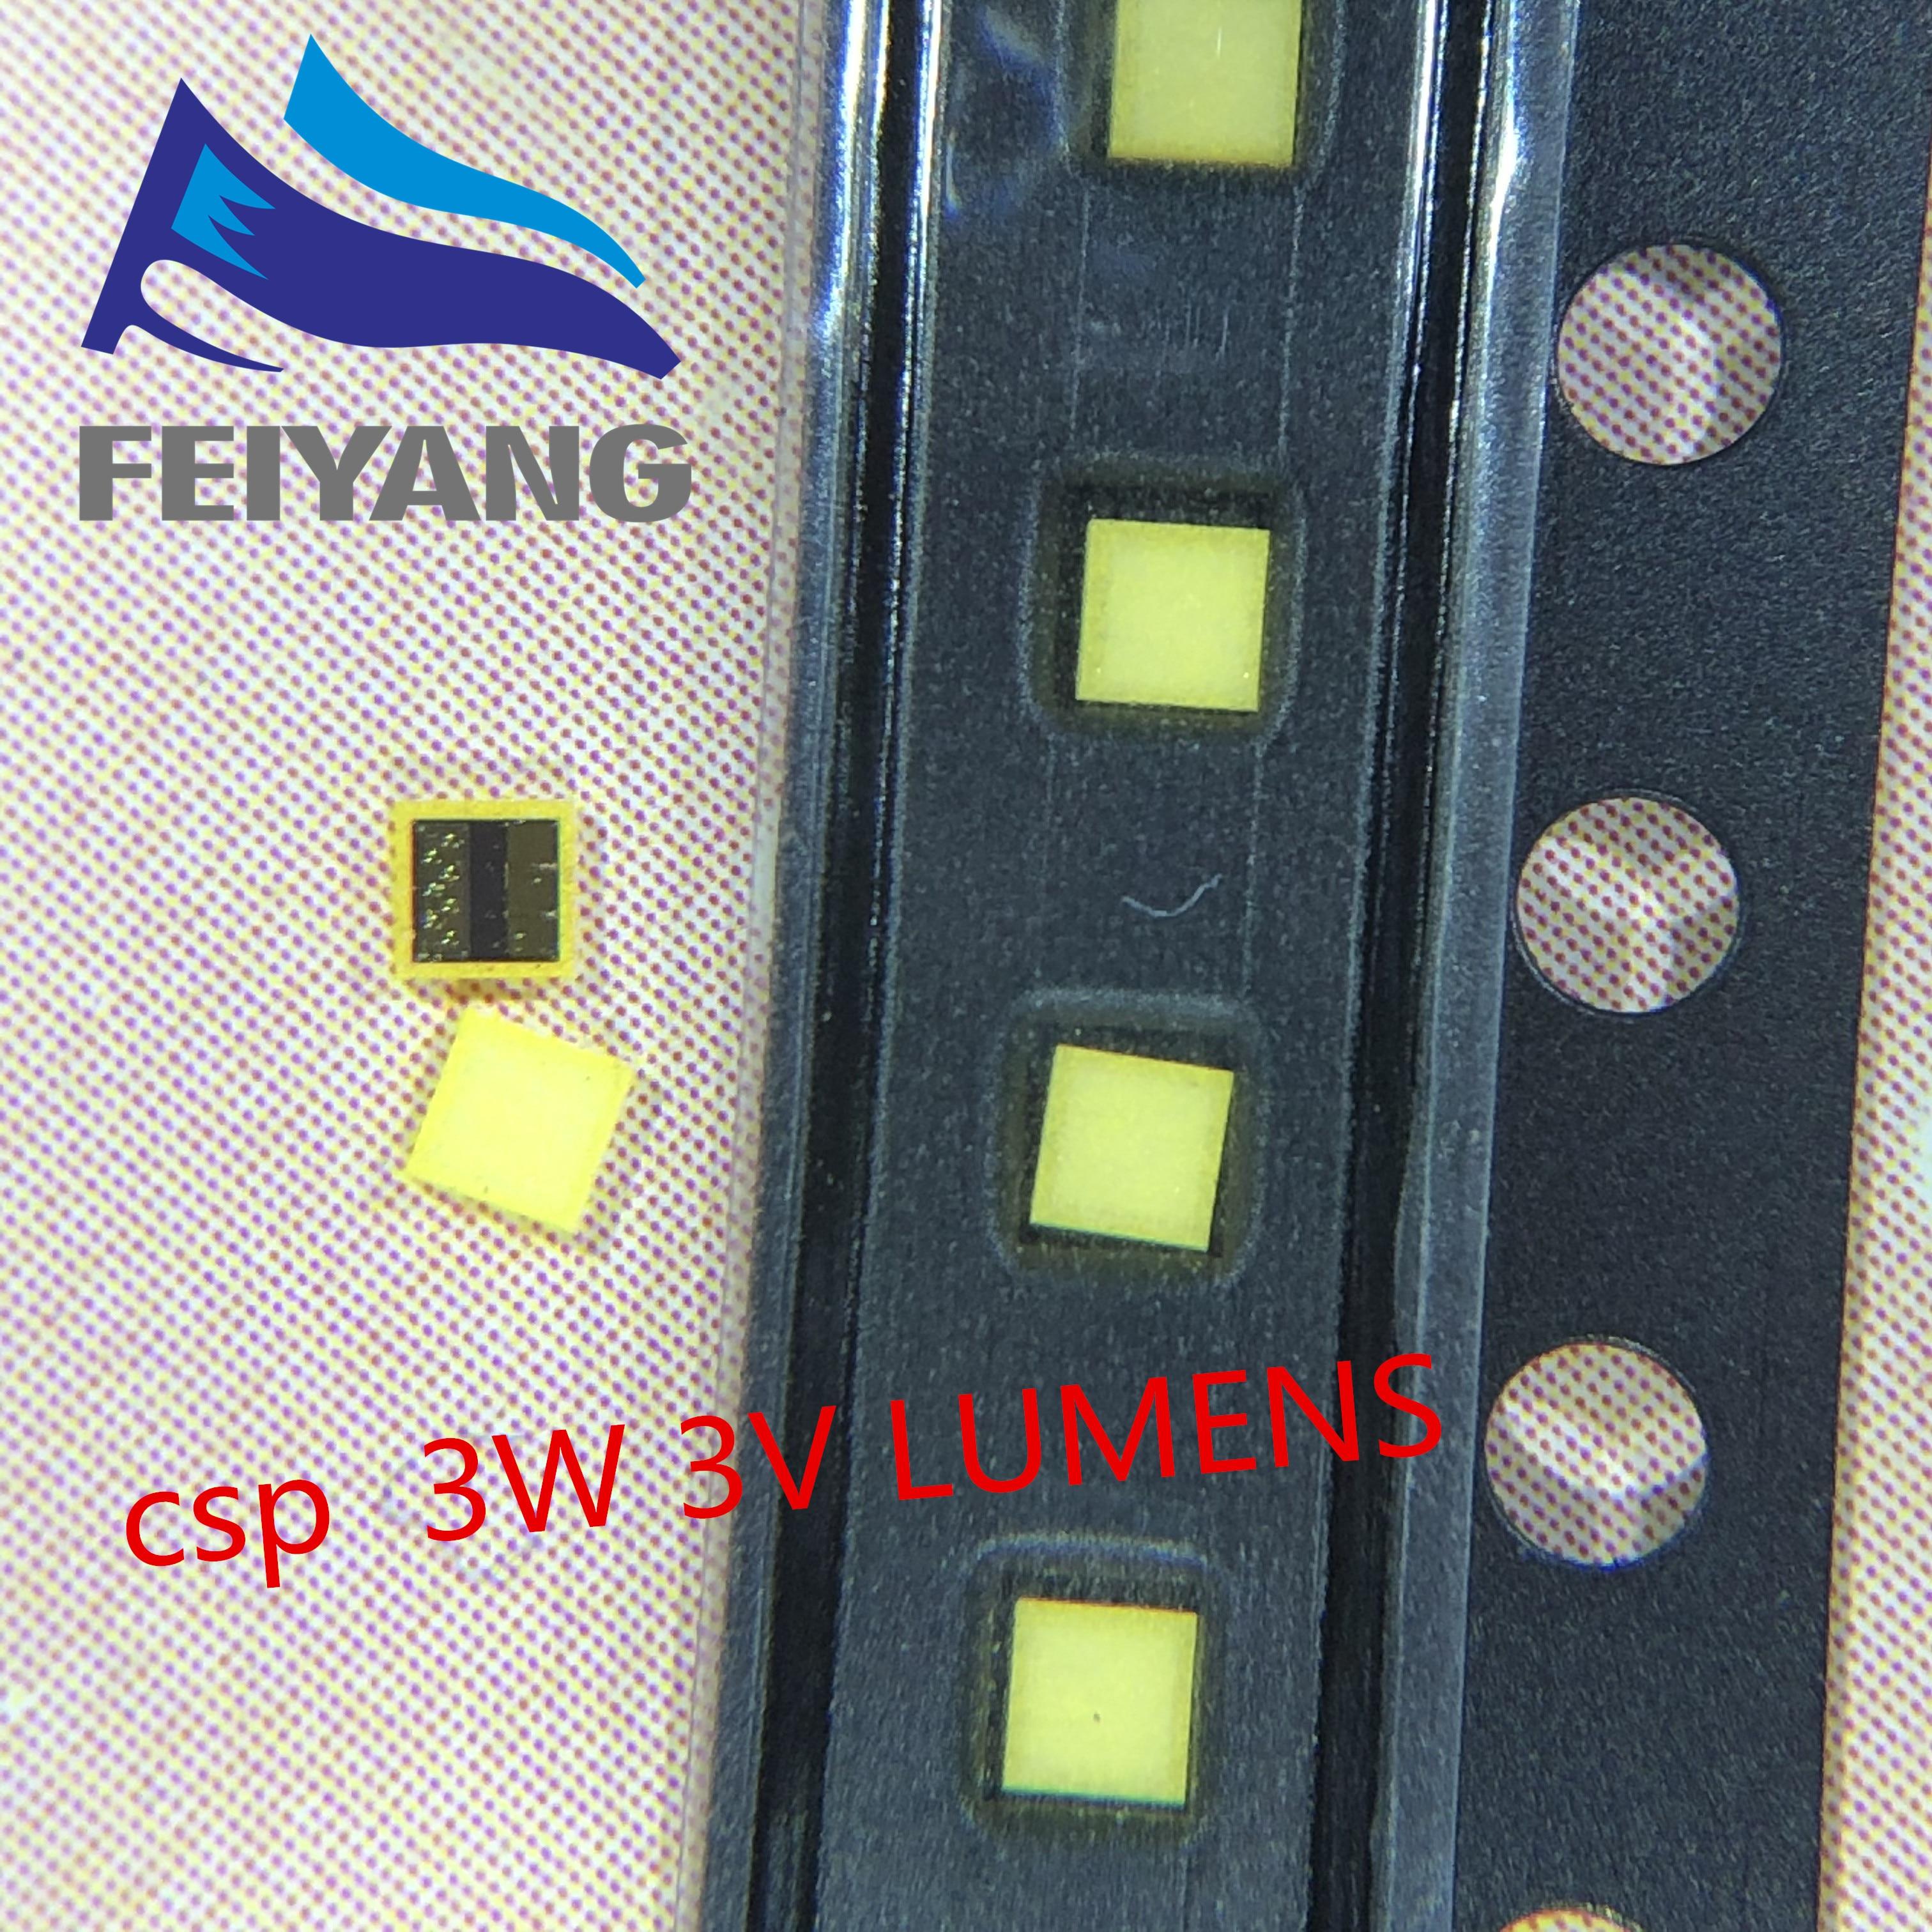 Lúmenes LED escala Chip paquete 3W CSP 1616 3V blanco 190LM iluminación LCD trasera para TV aplicación de TV A142AEAEBP28A 1000 Uds